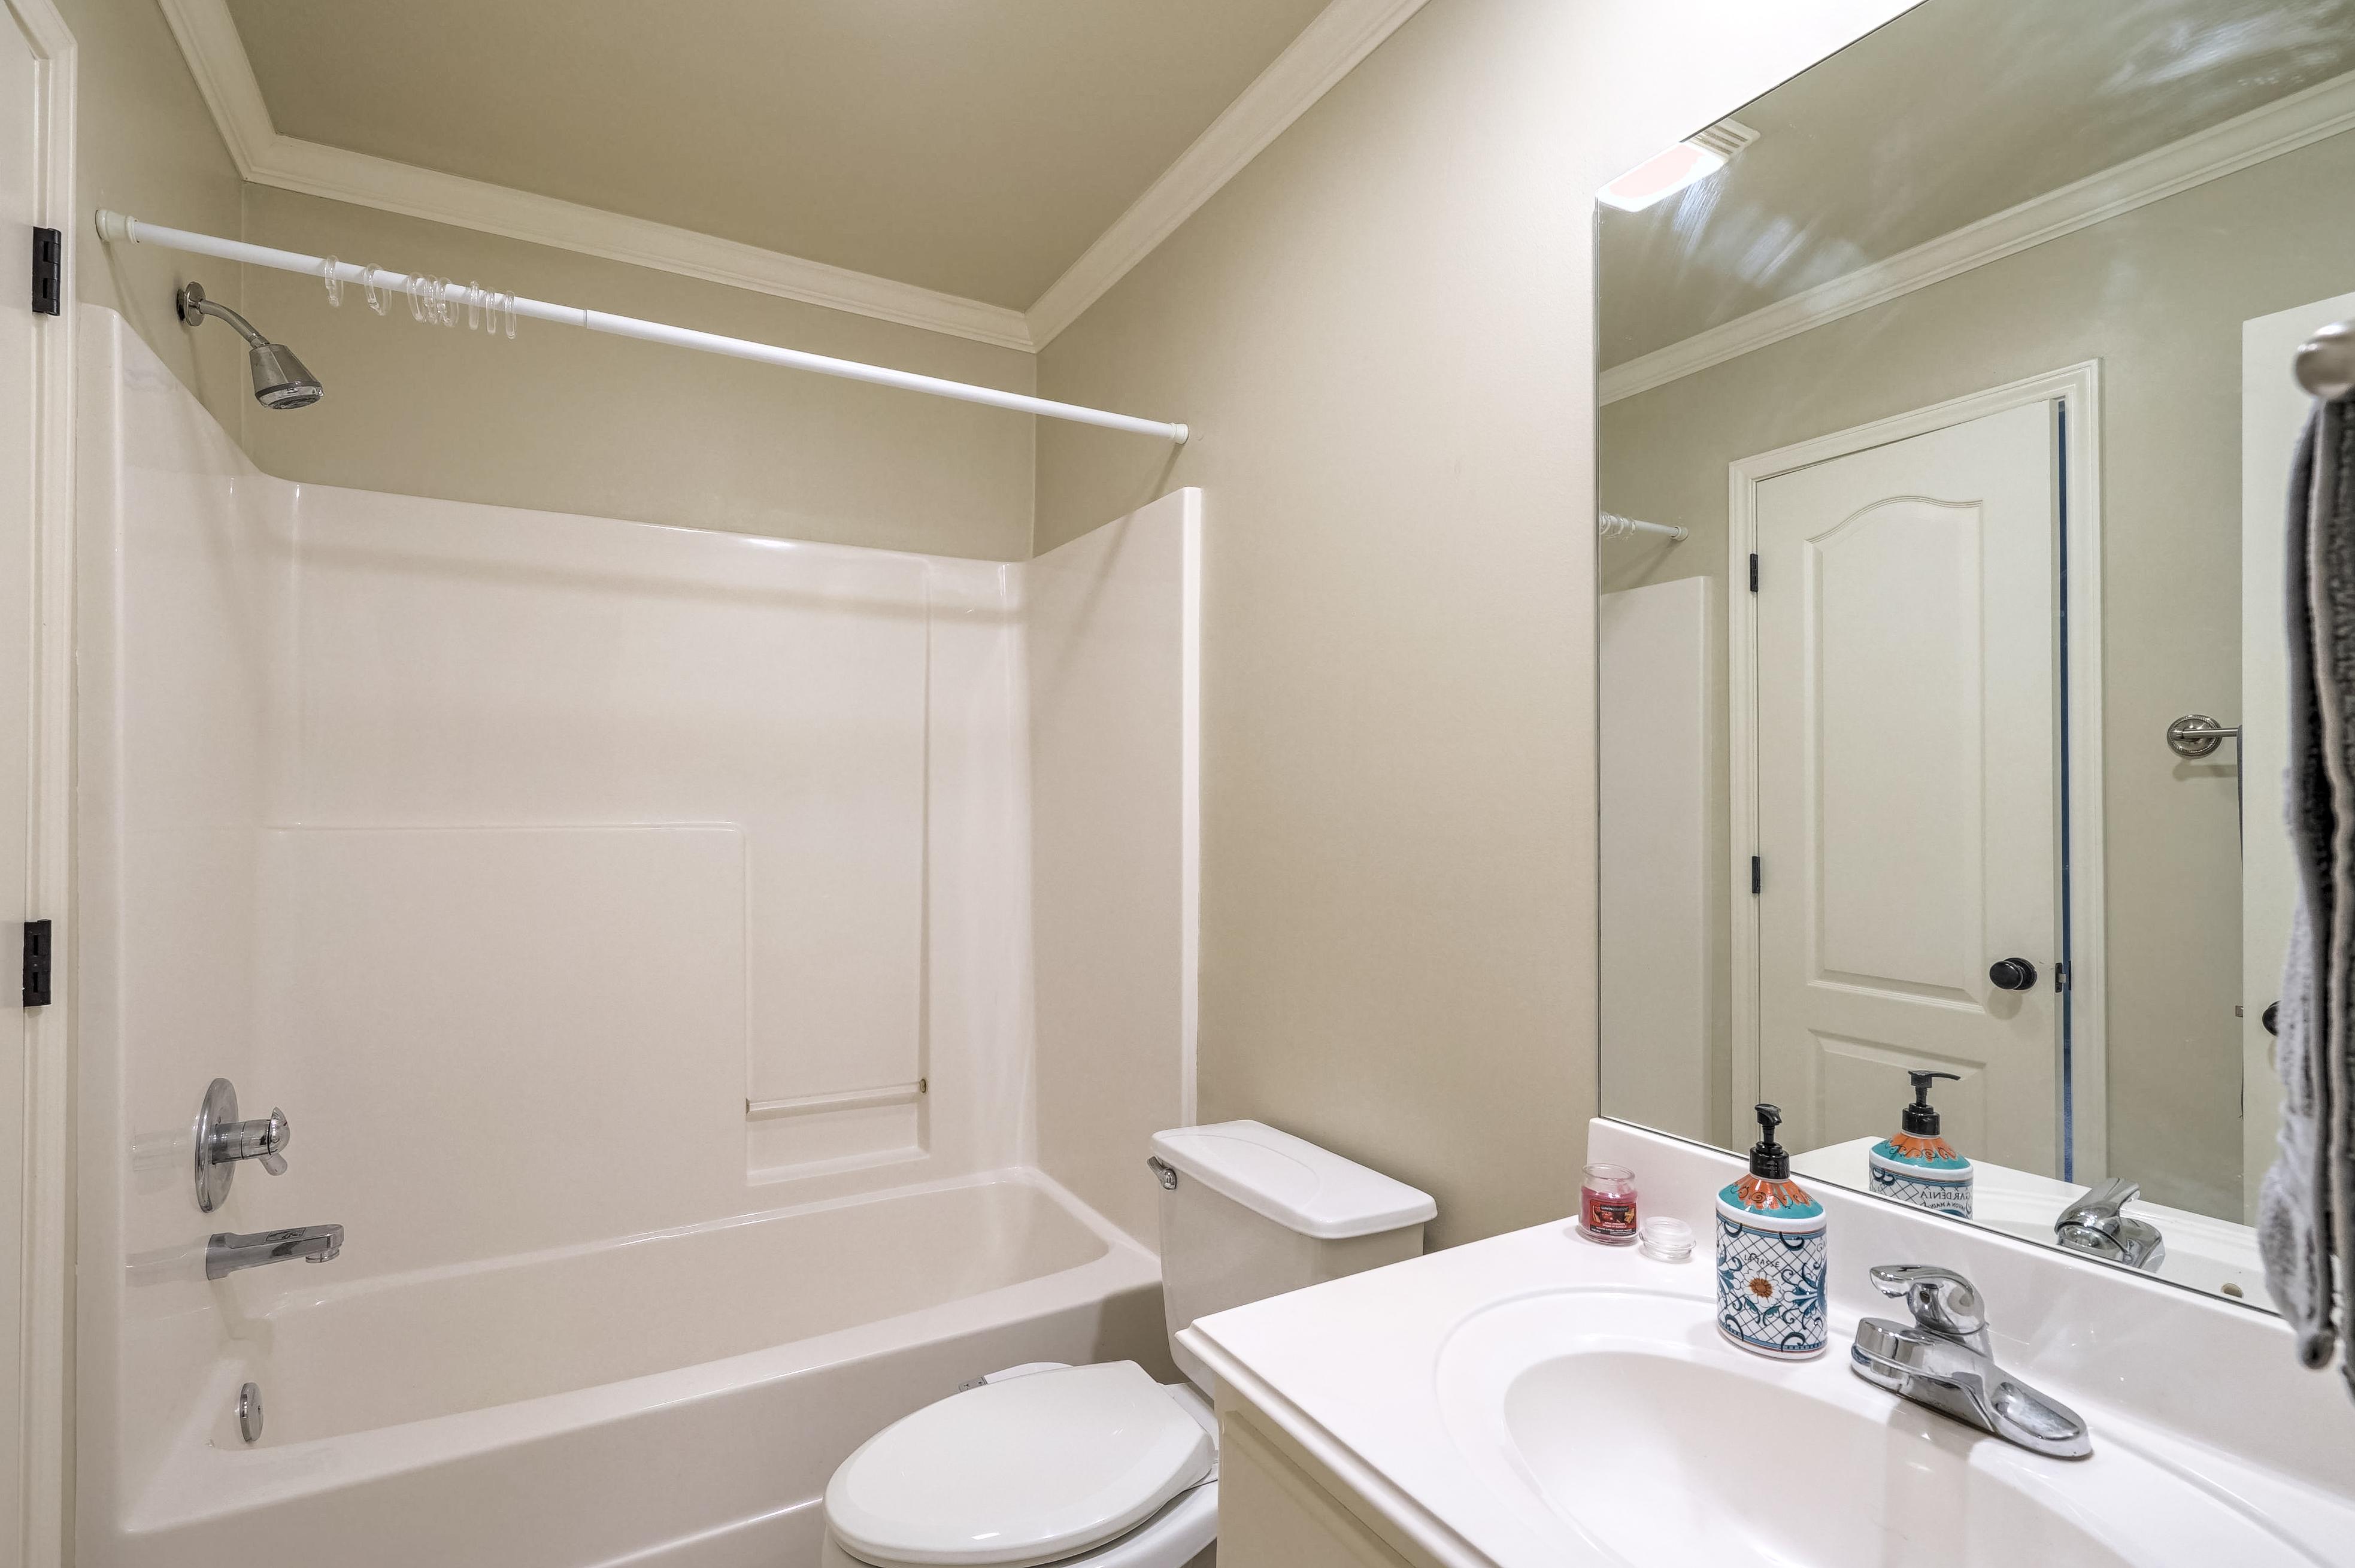 10320 S 92nd East Avenue Property Photo 32